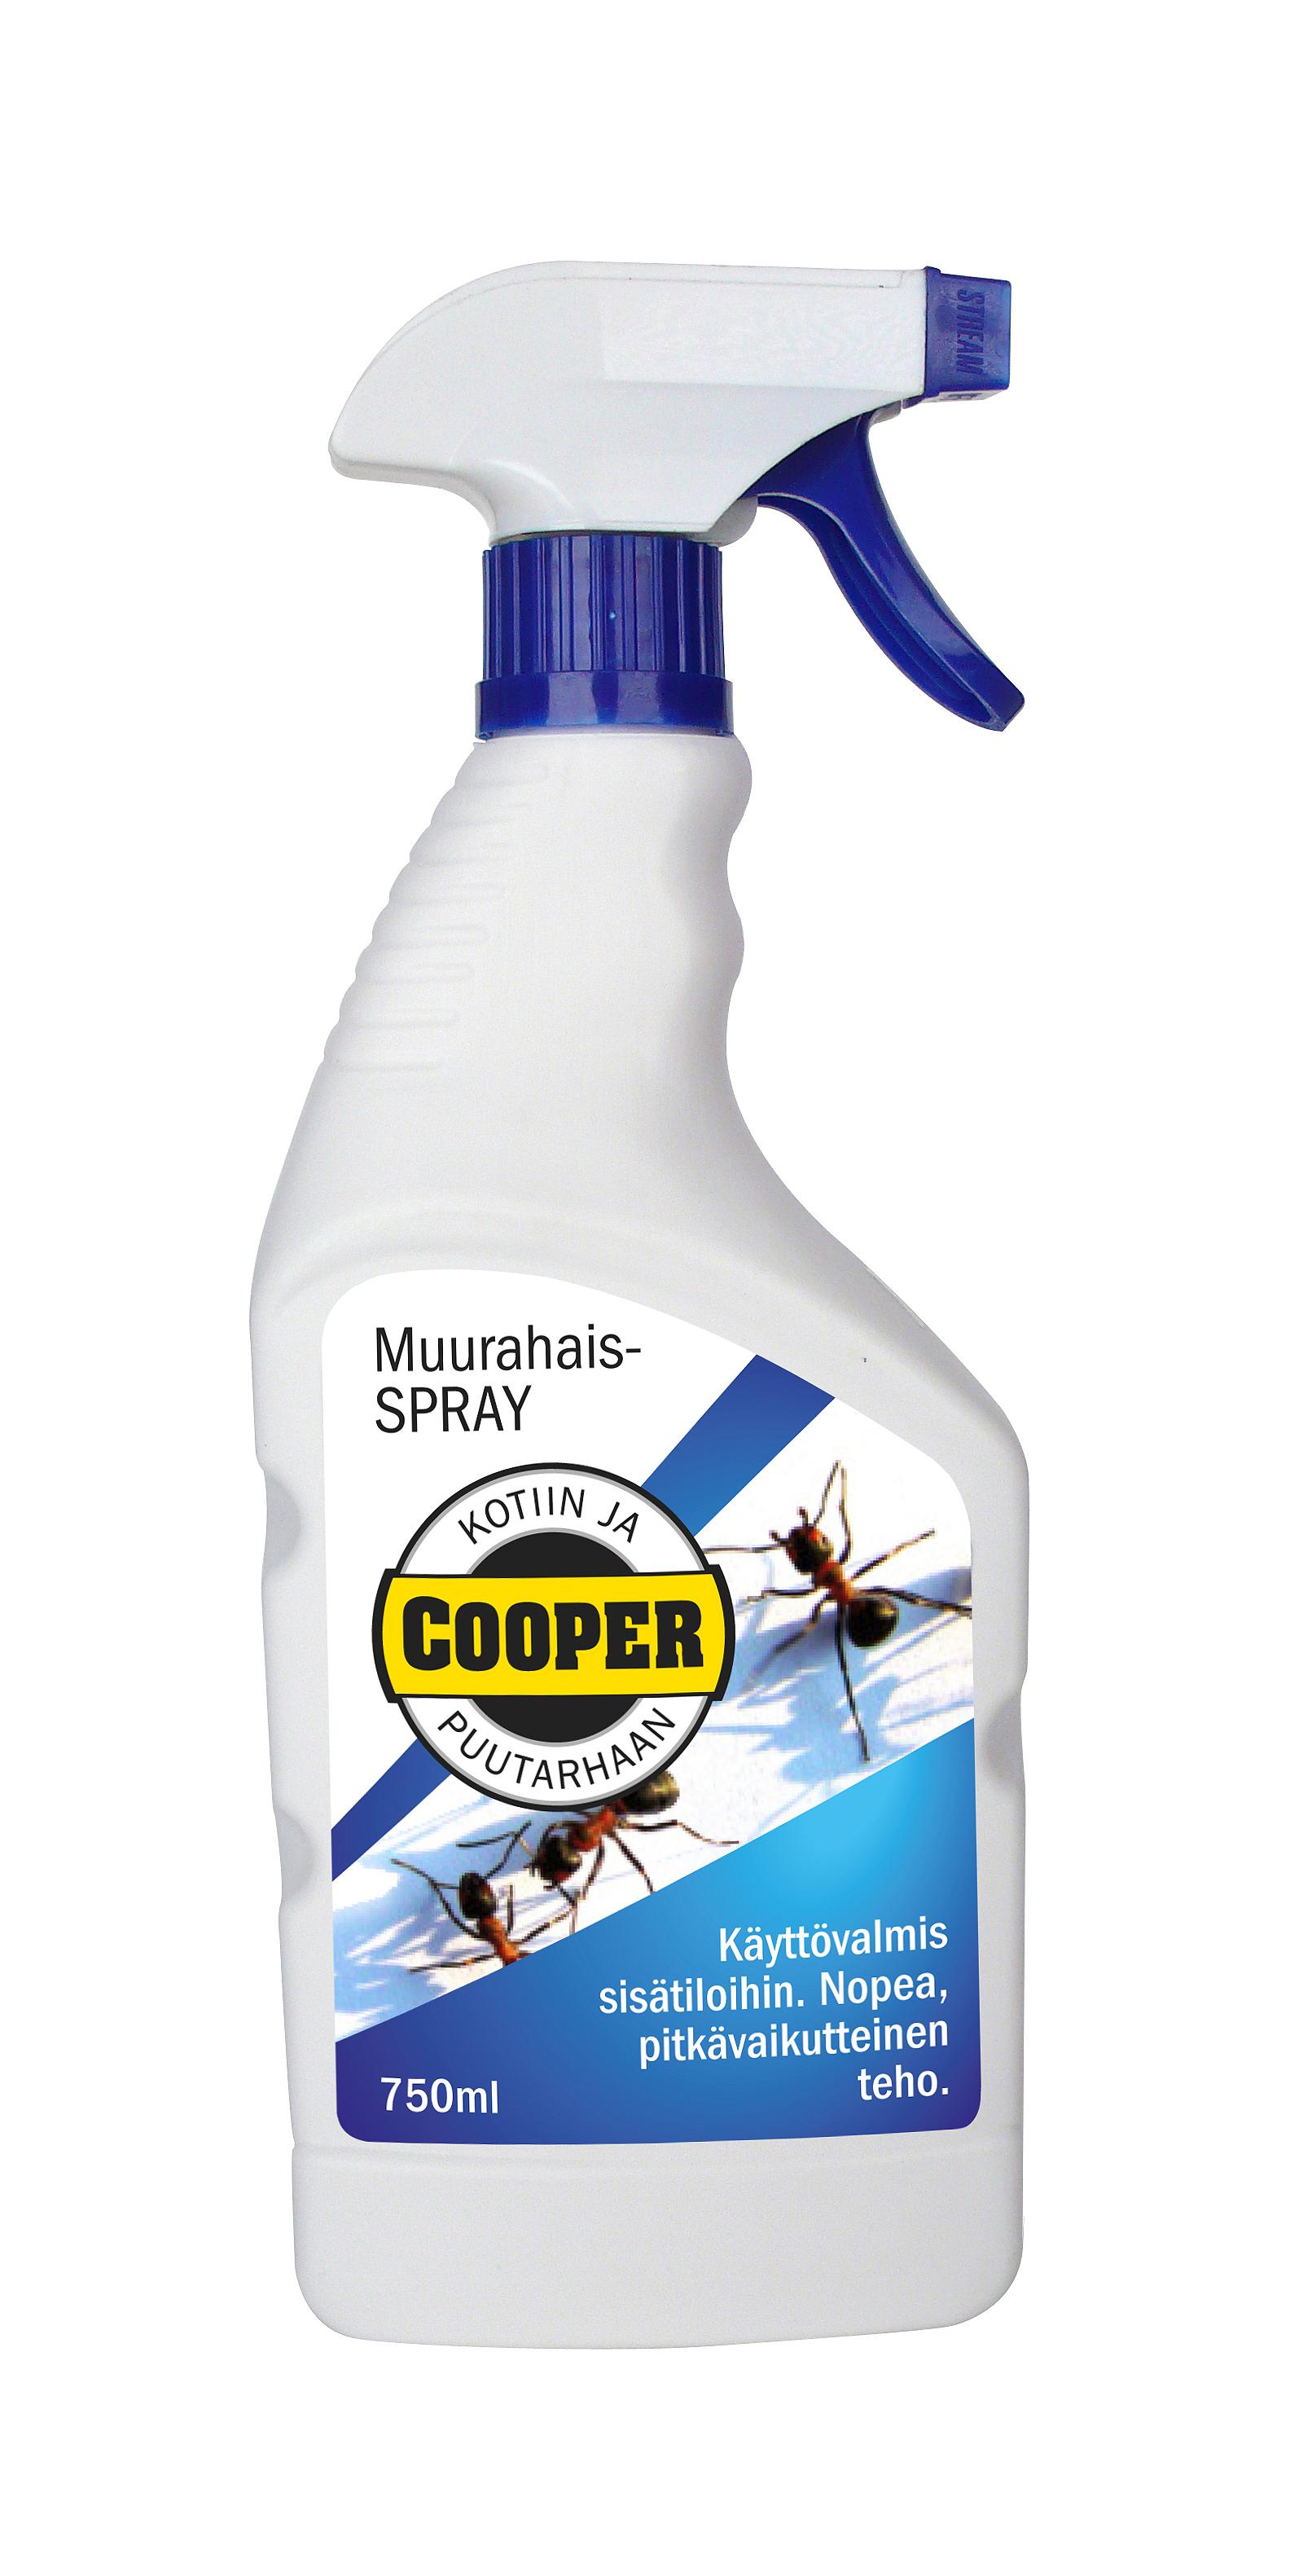 Cooper -muurahaisspray 750 ml